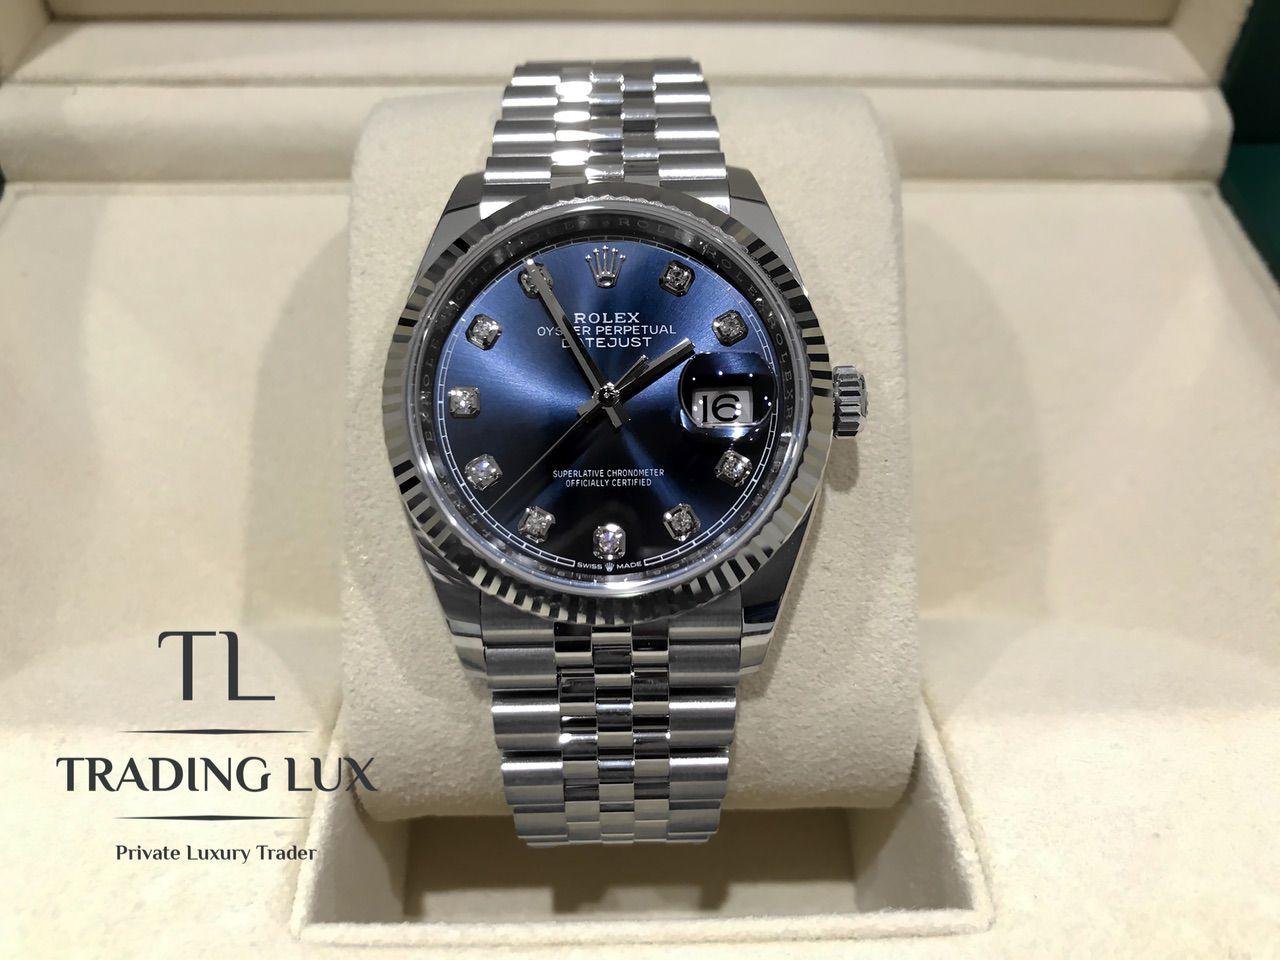 Rolex-Datejust-126234-9